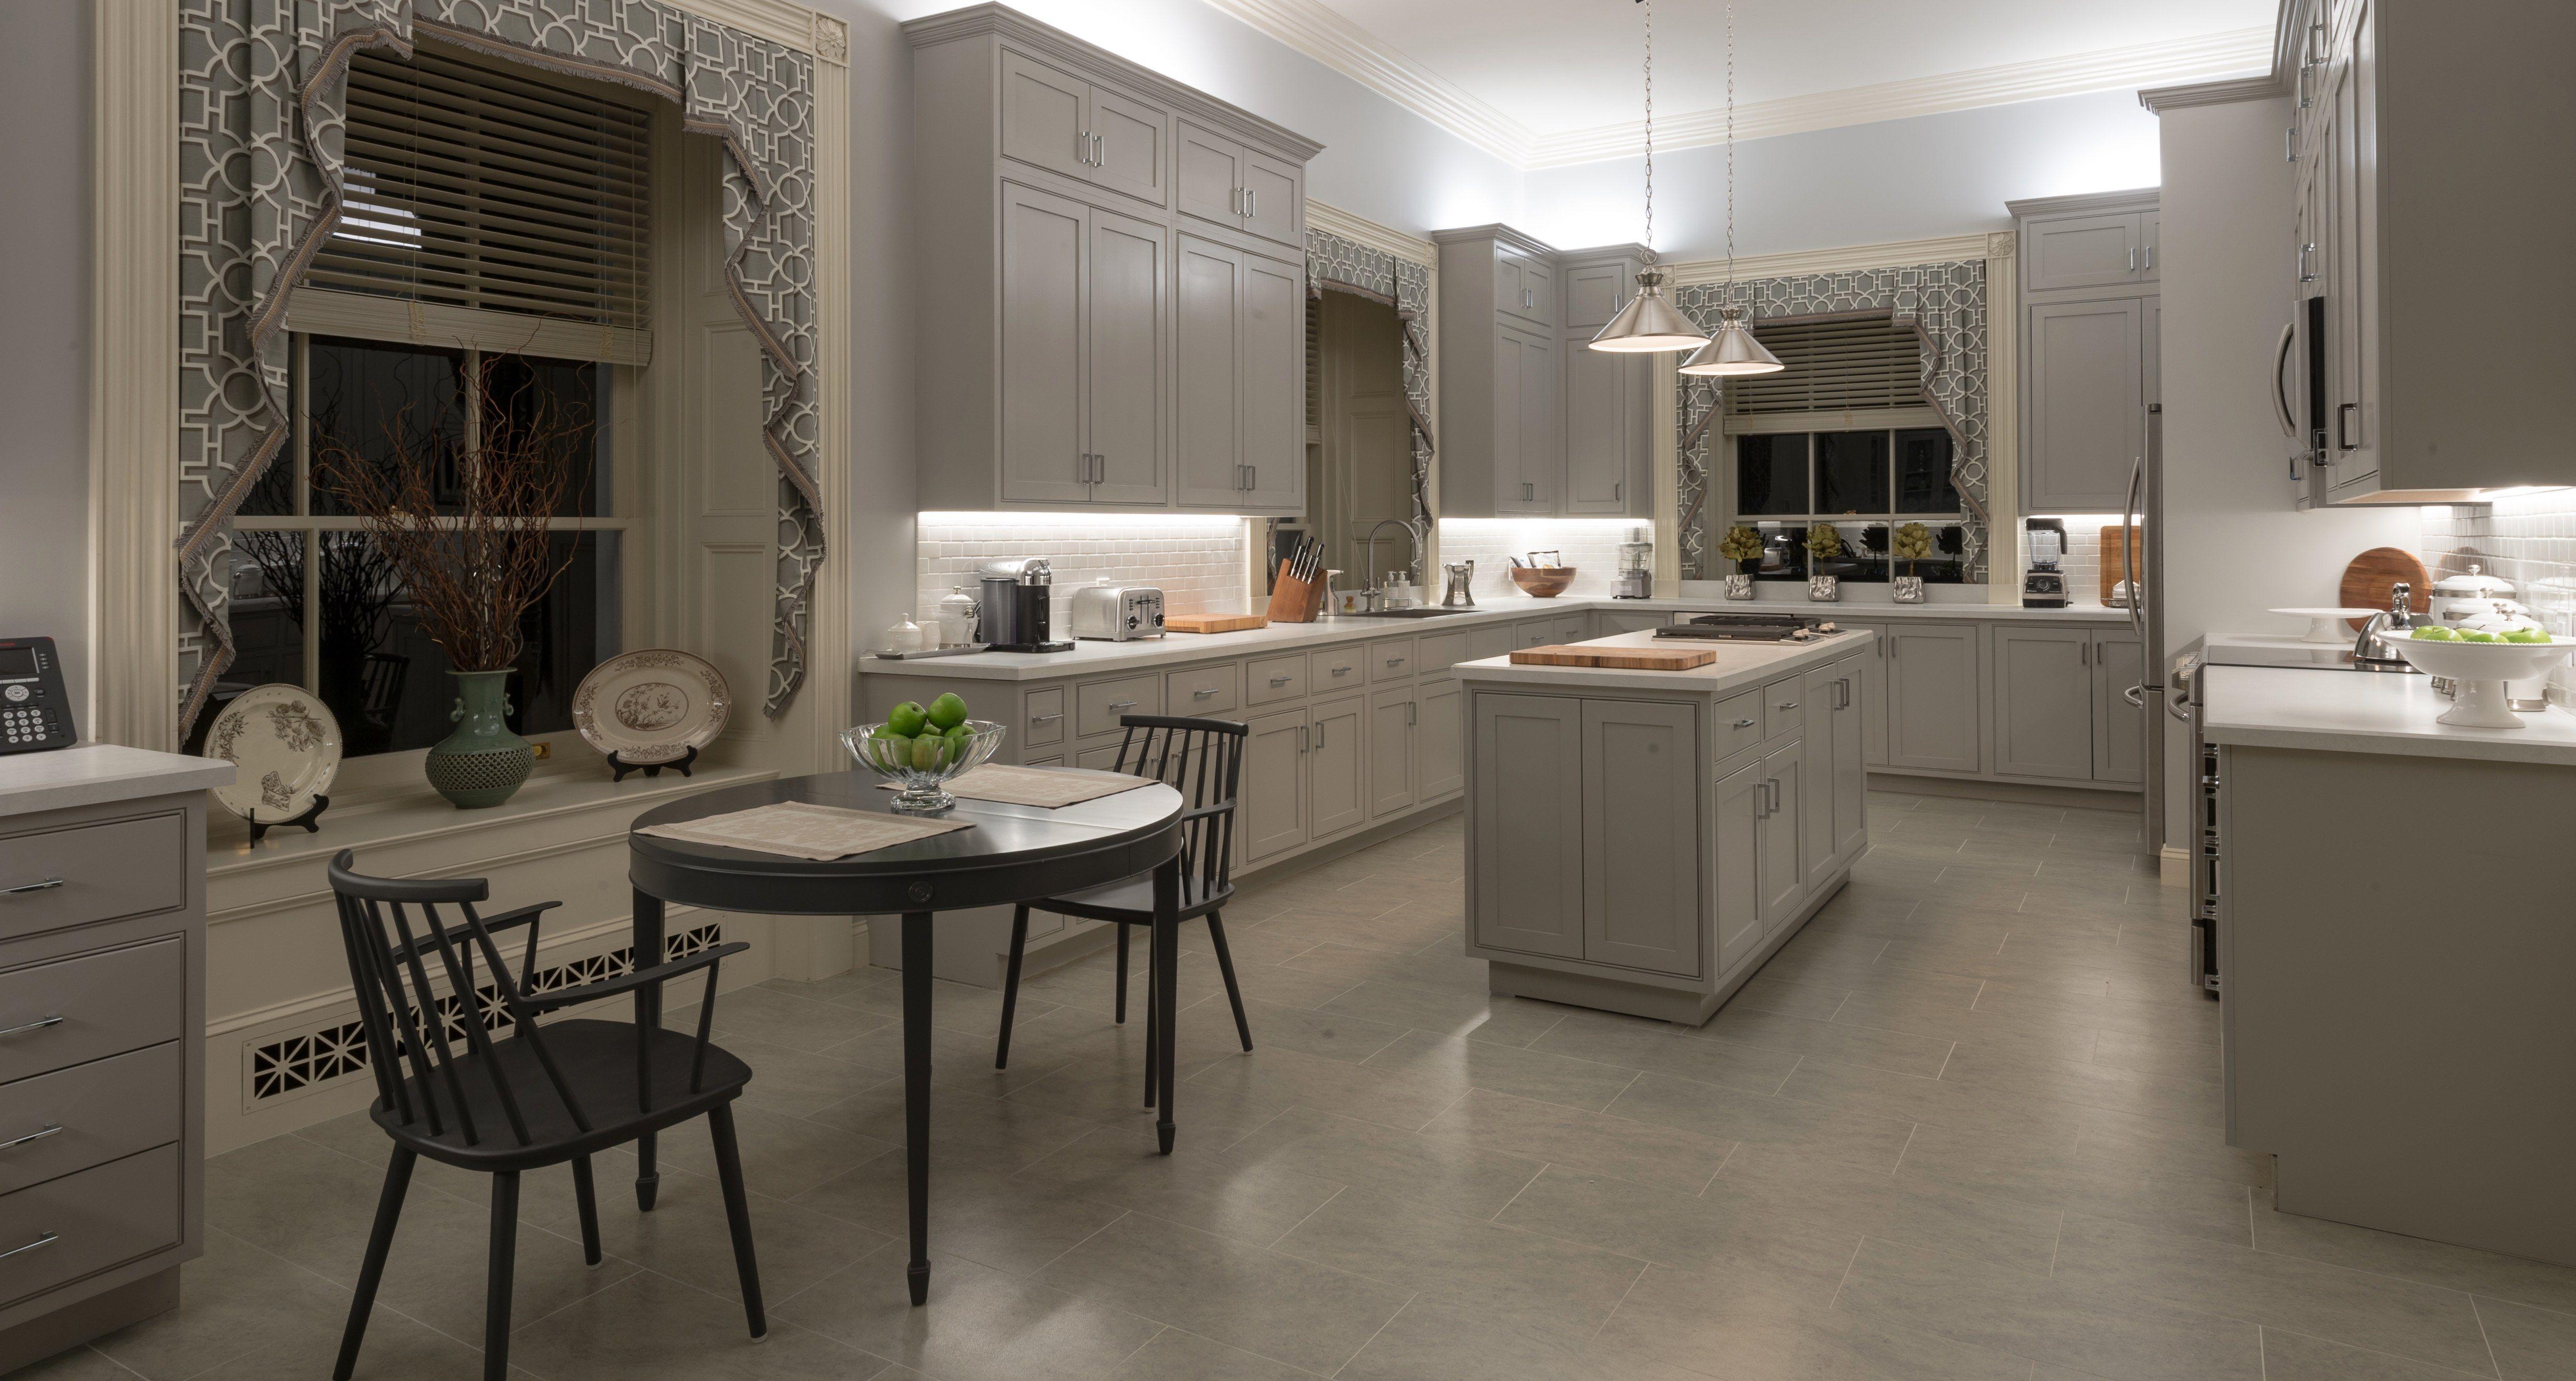 Tour The High Drama Sets Of House Of Cards Kitchen Decor Sets Wine Decor Kitchen Kitchen Design